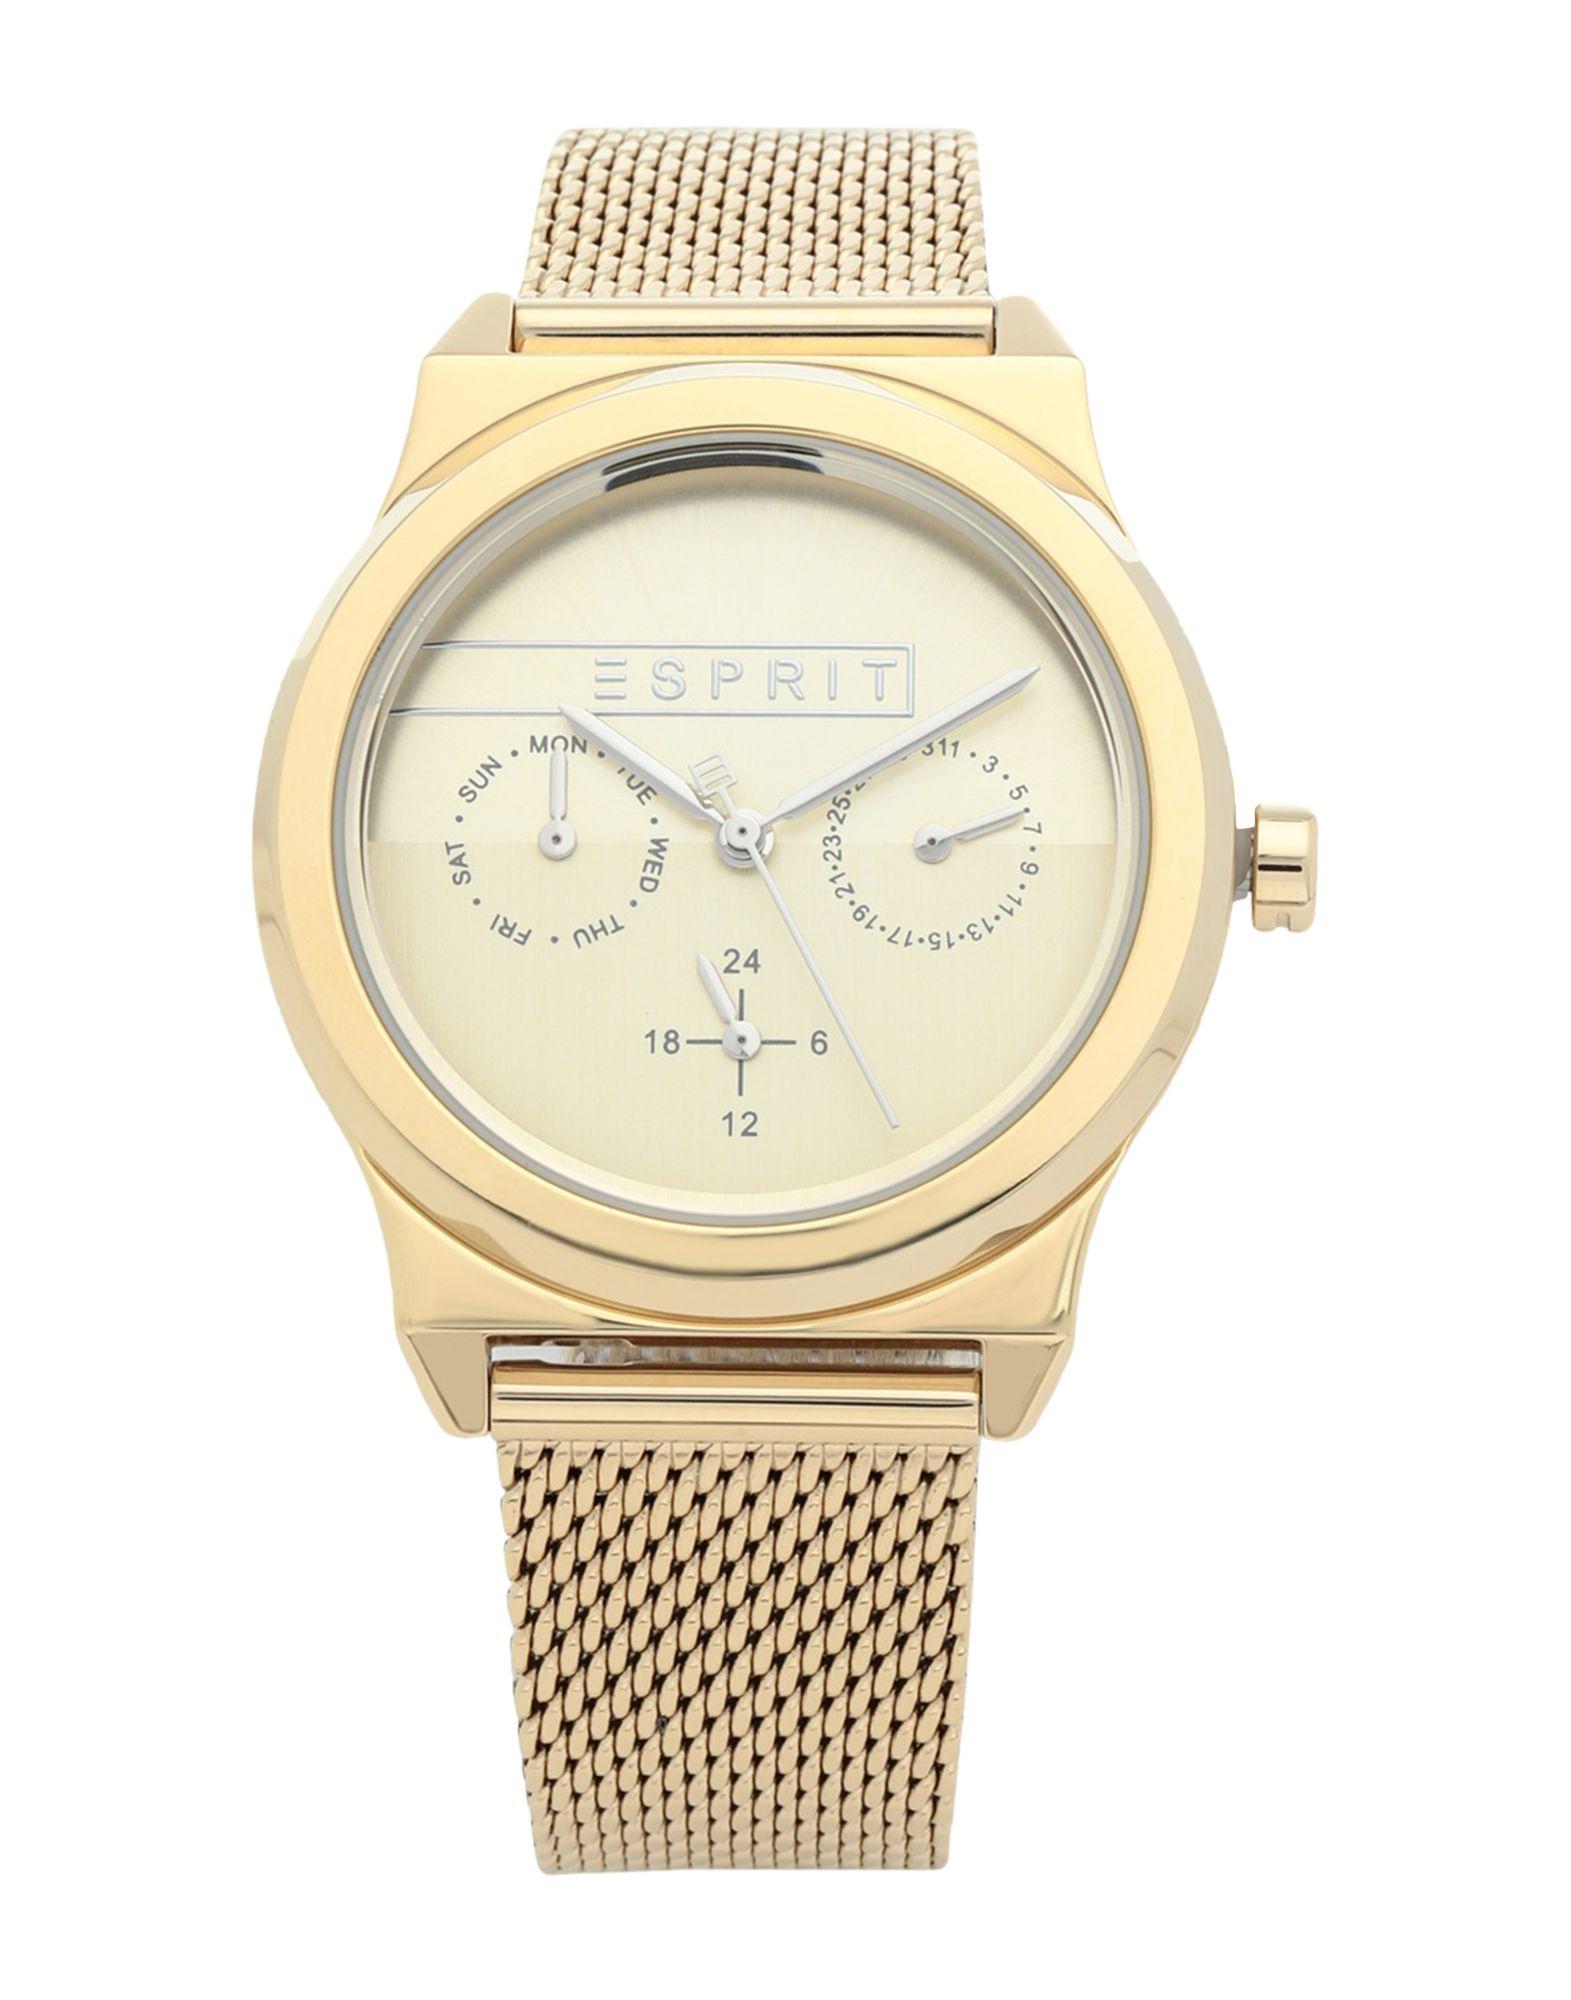 цена ESPRIT Наручные часы онлайн в 2017 году